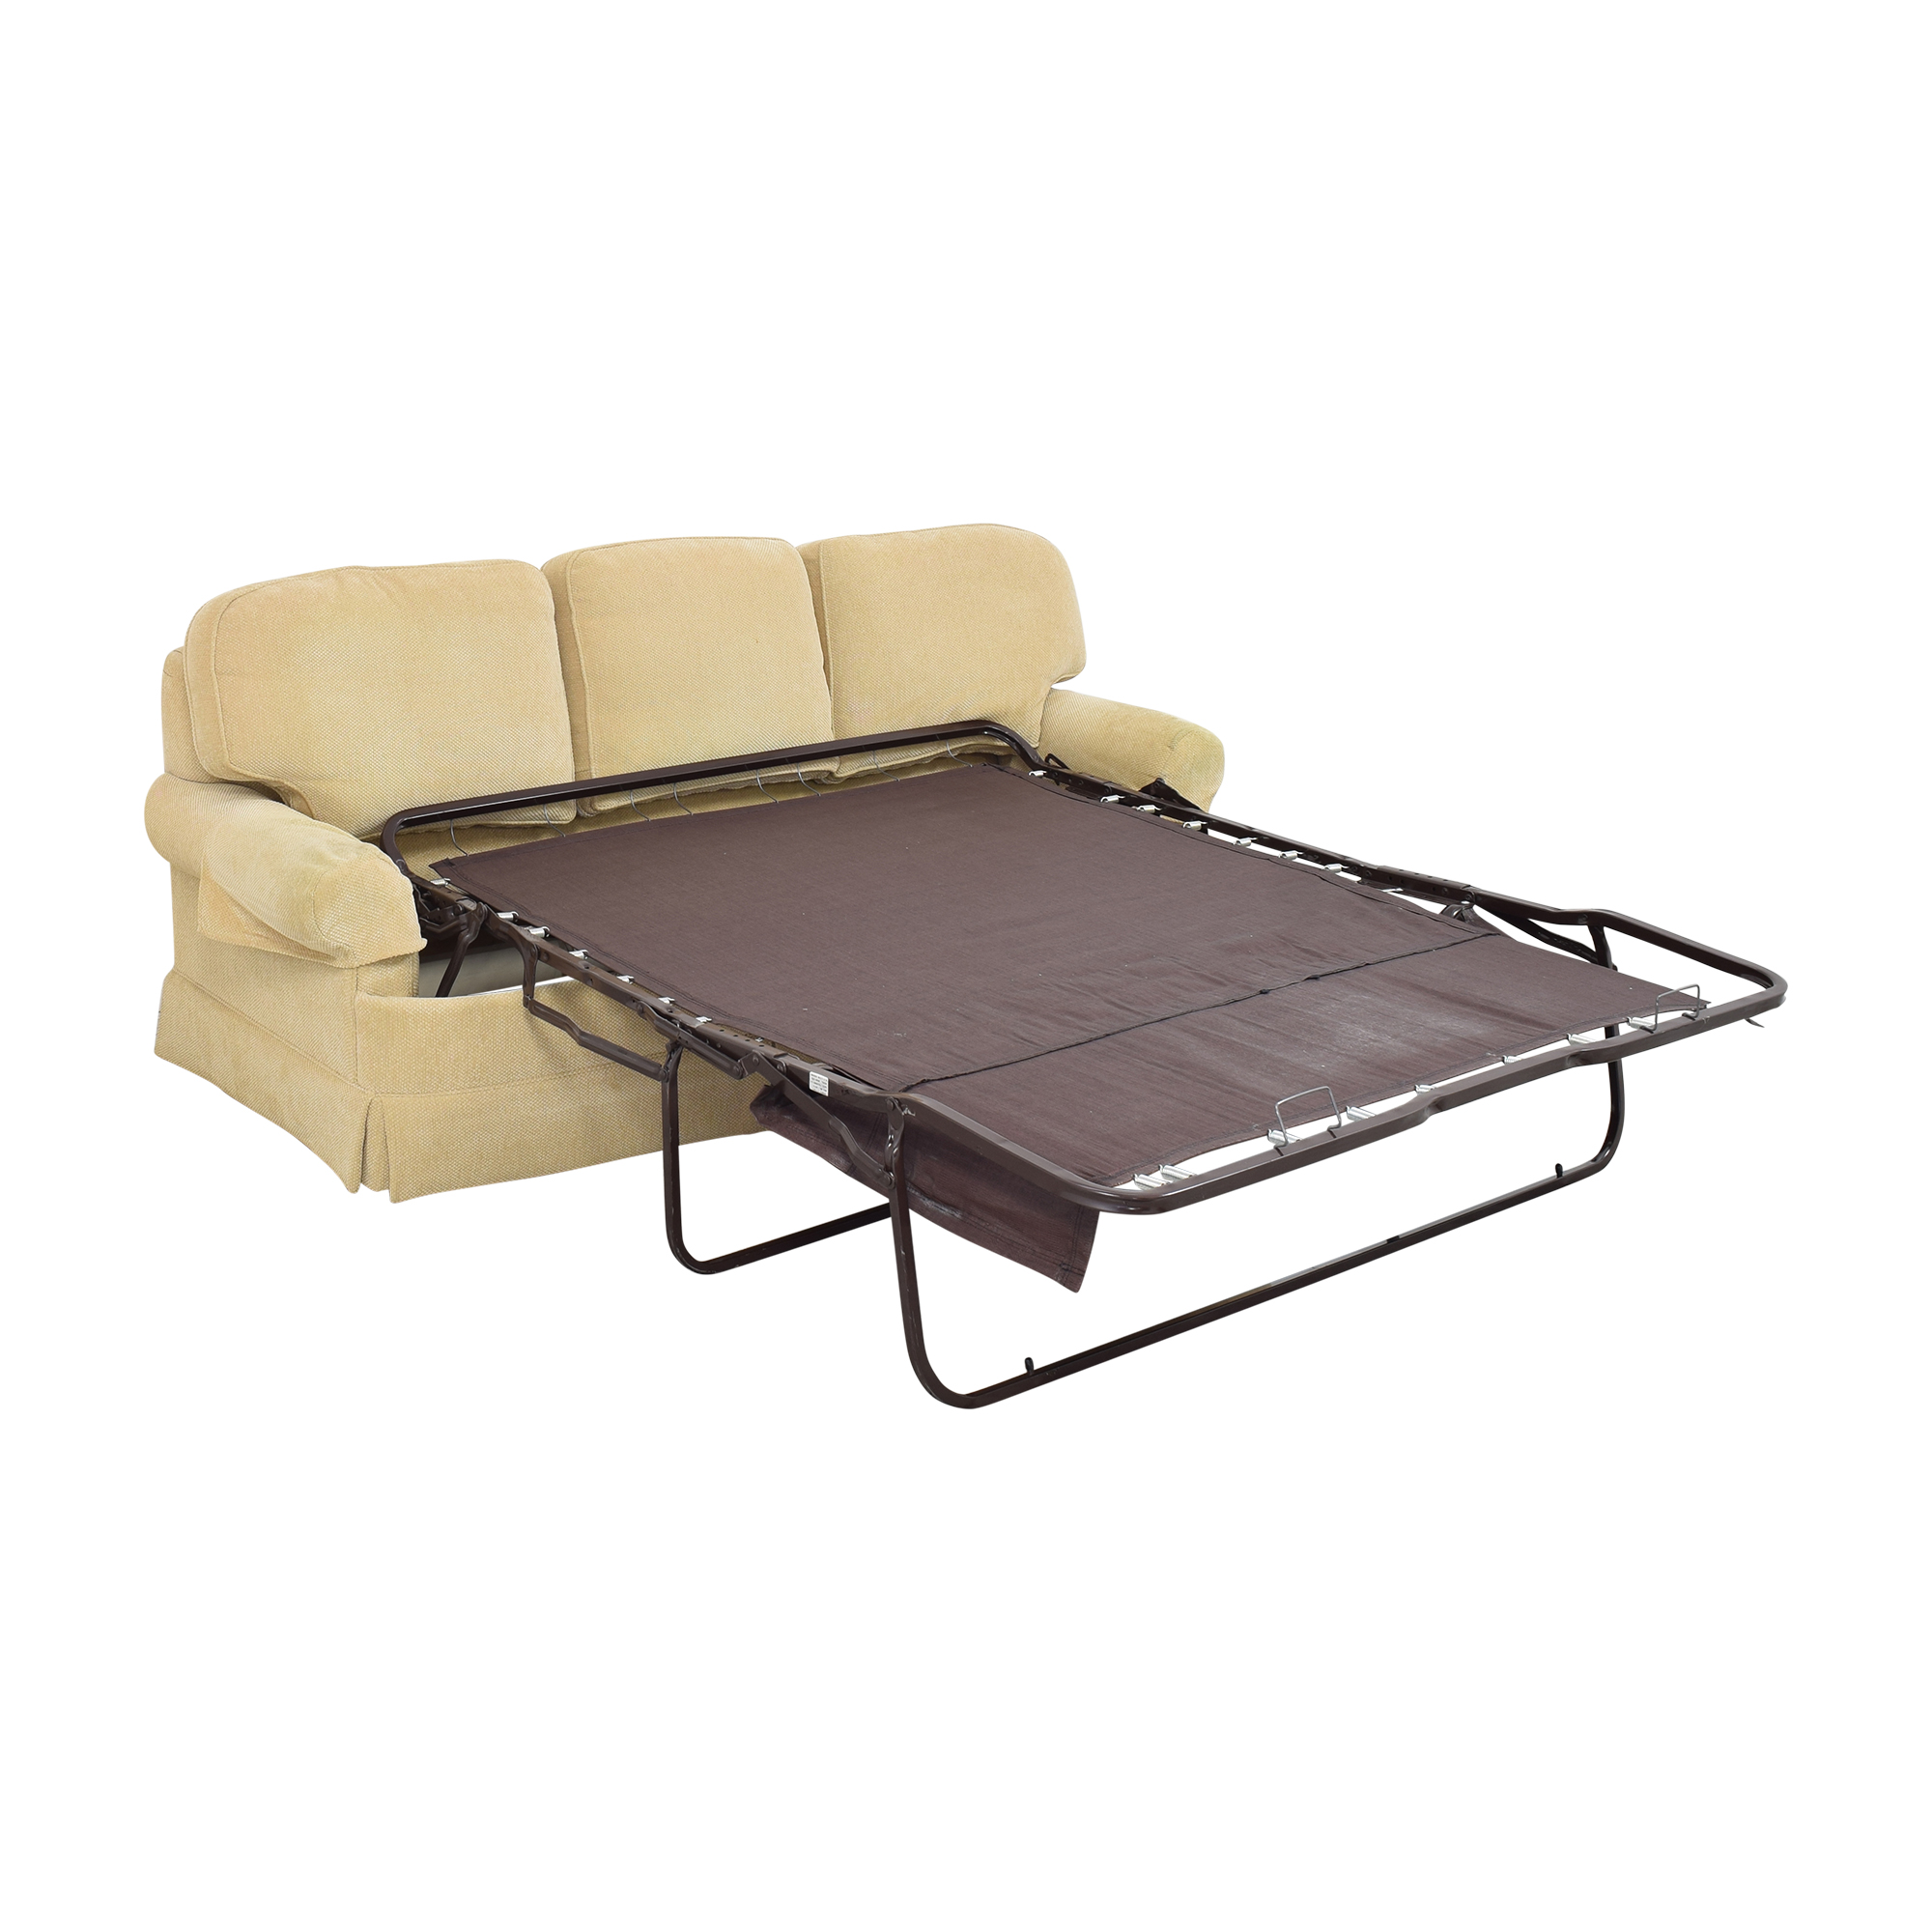 Ralph Lauren Home Ralph Lauren Roll Arm Sleeper Sofa on sale